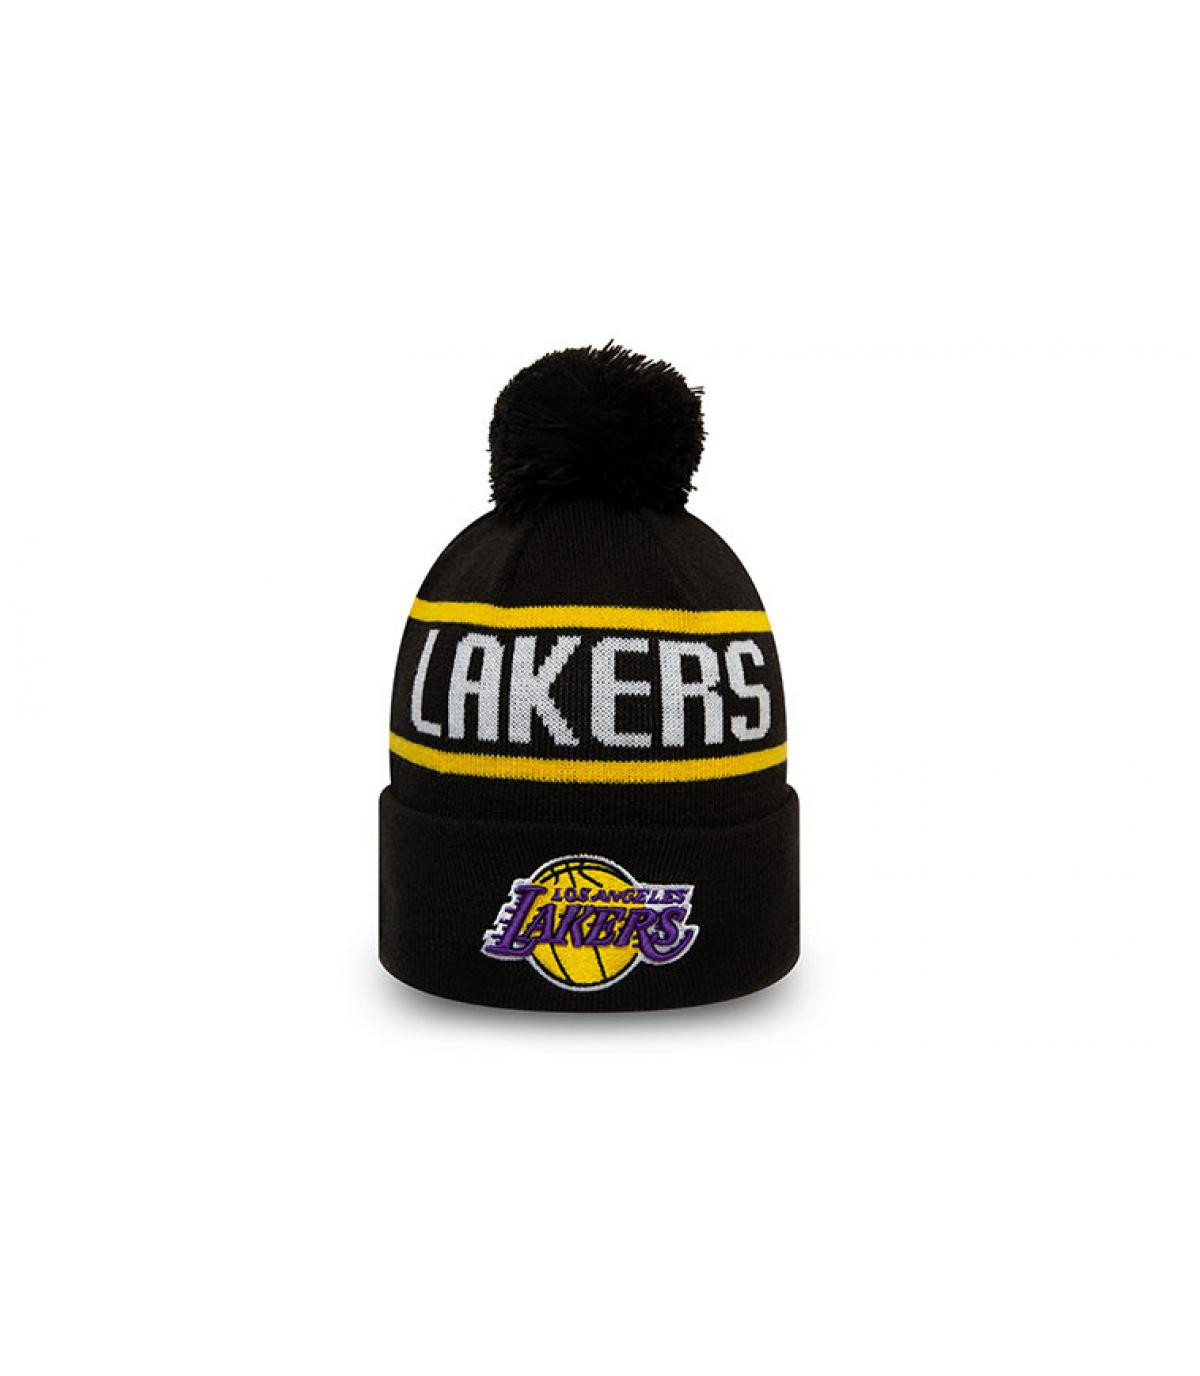 Detalles Bobble Knit Lakers imagen 2